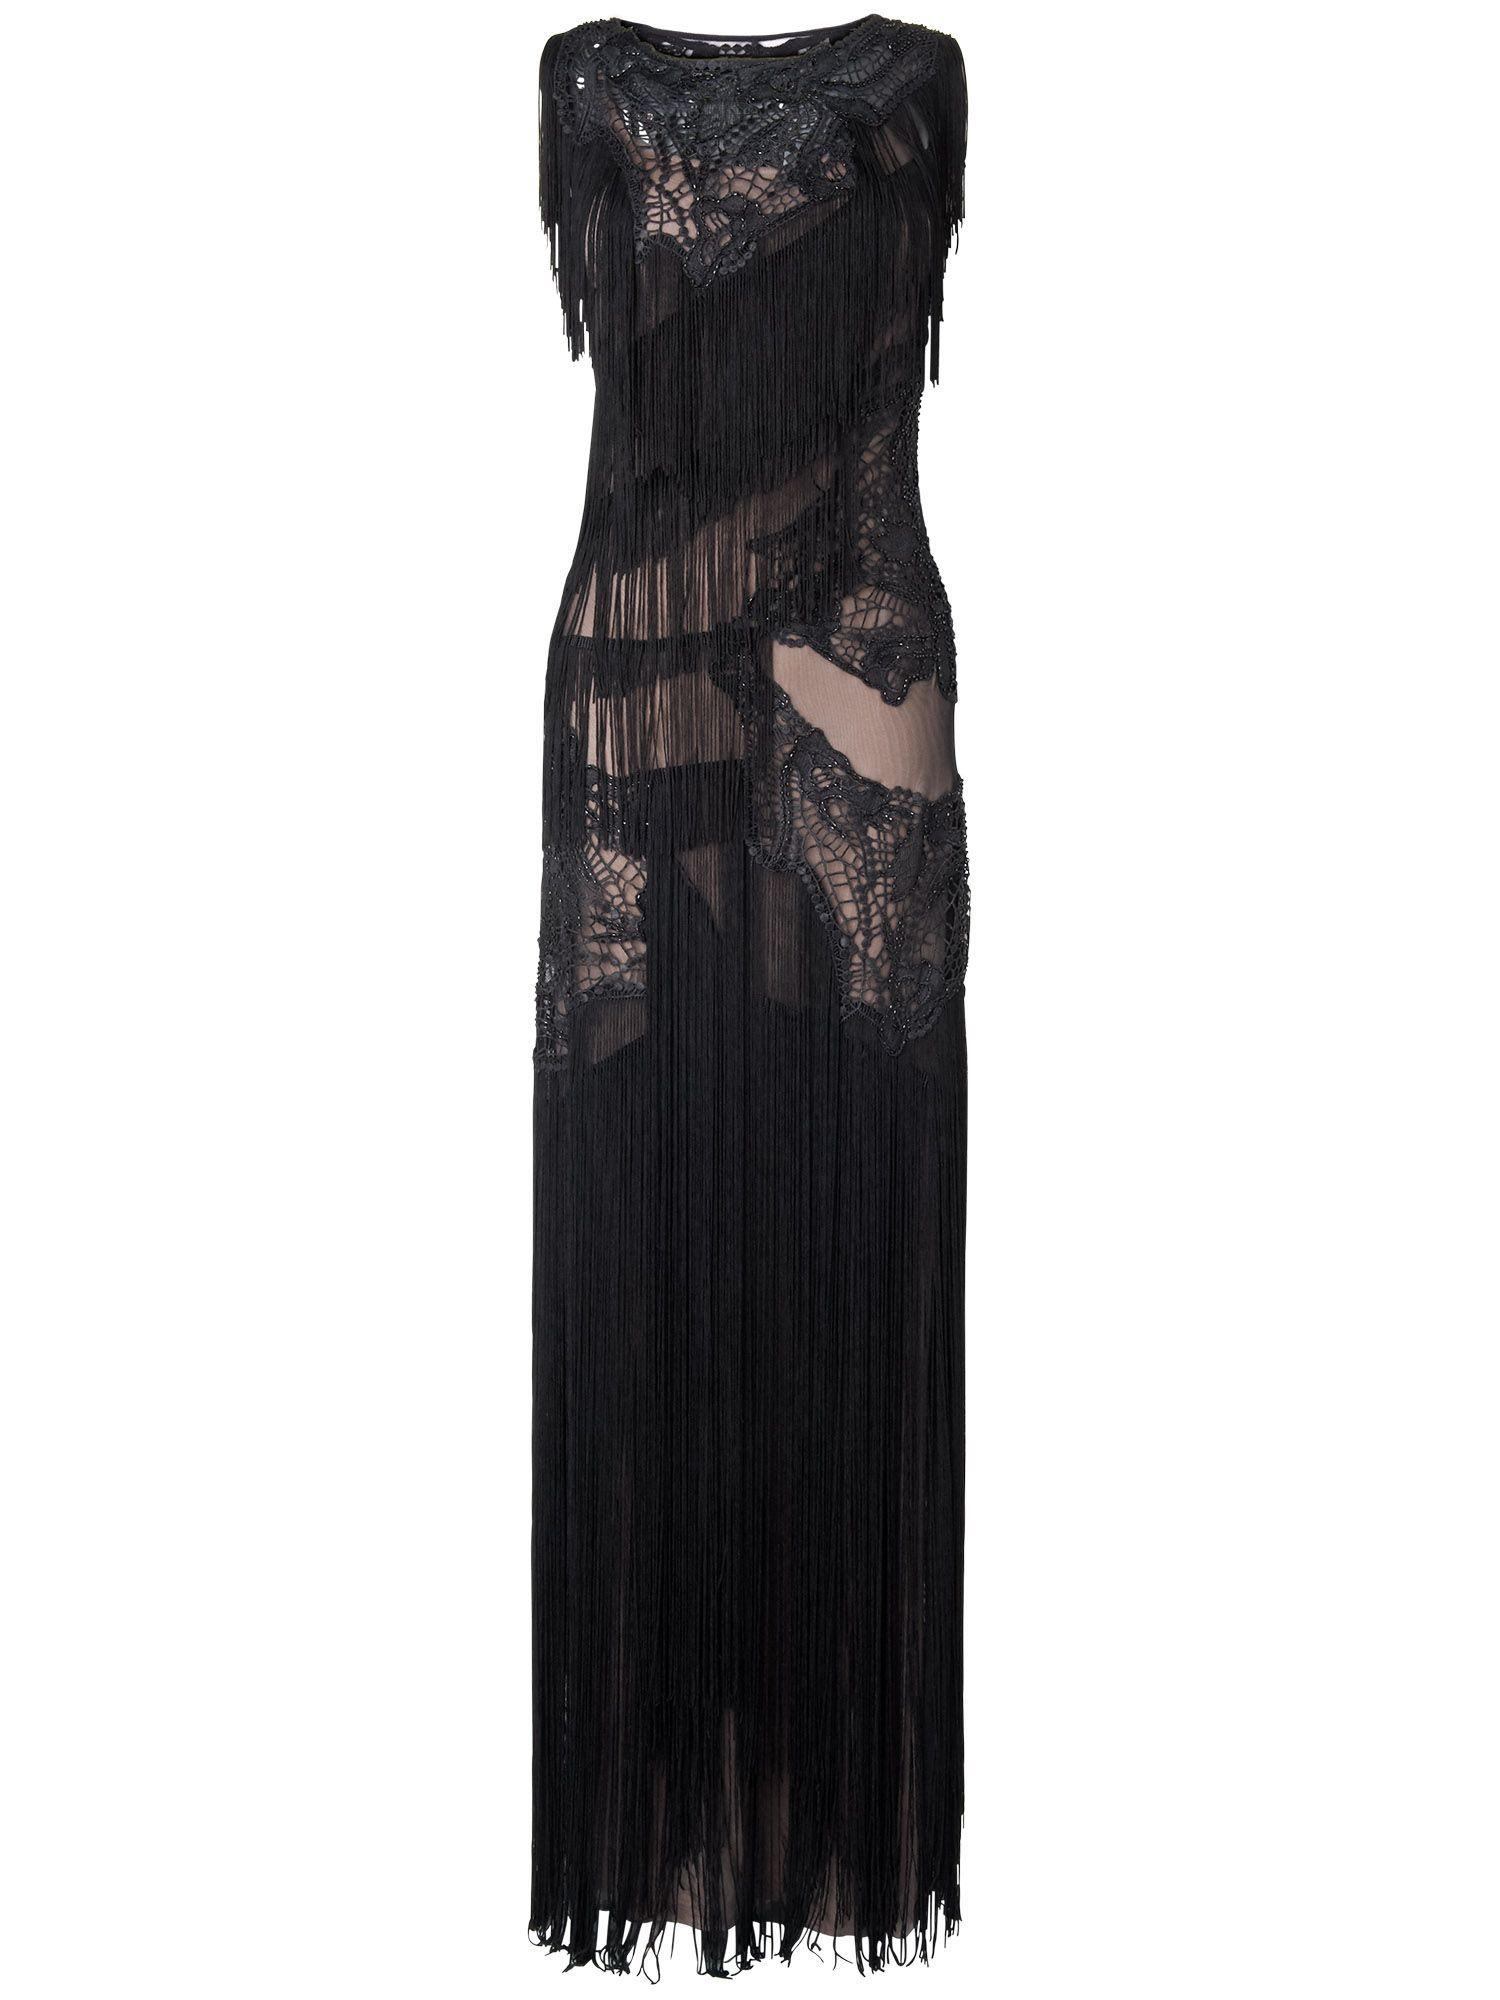 Fringe dress cheap uk